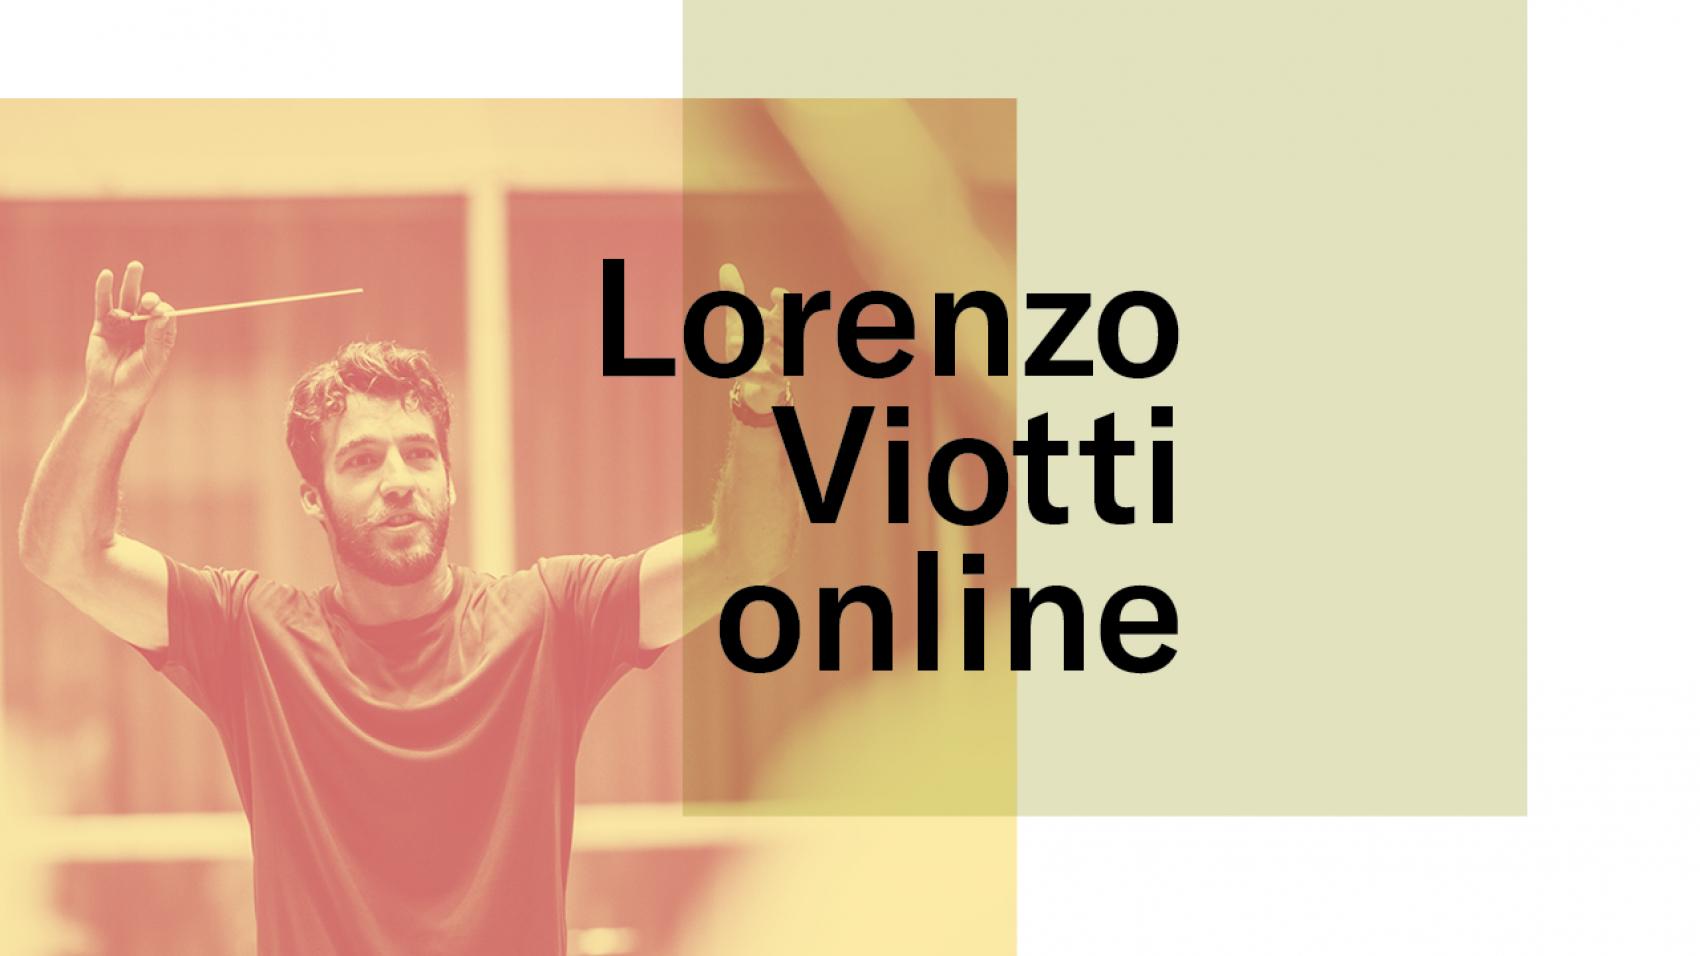 Concert stream: Lorenzo Viotti conducts Berlioz and Schumann